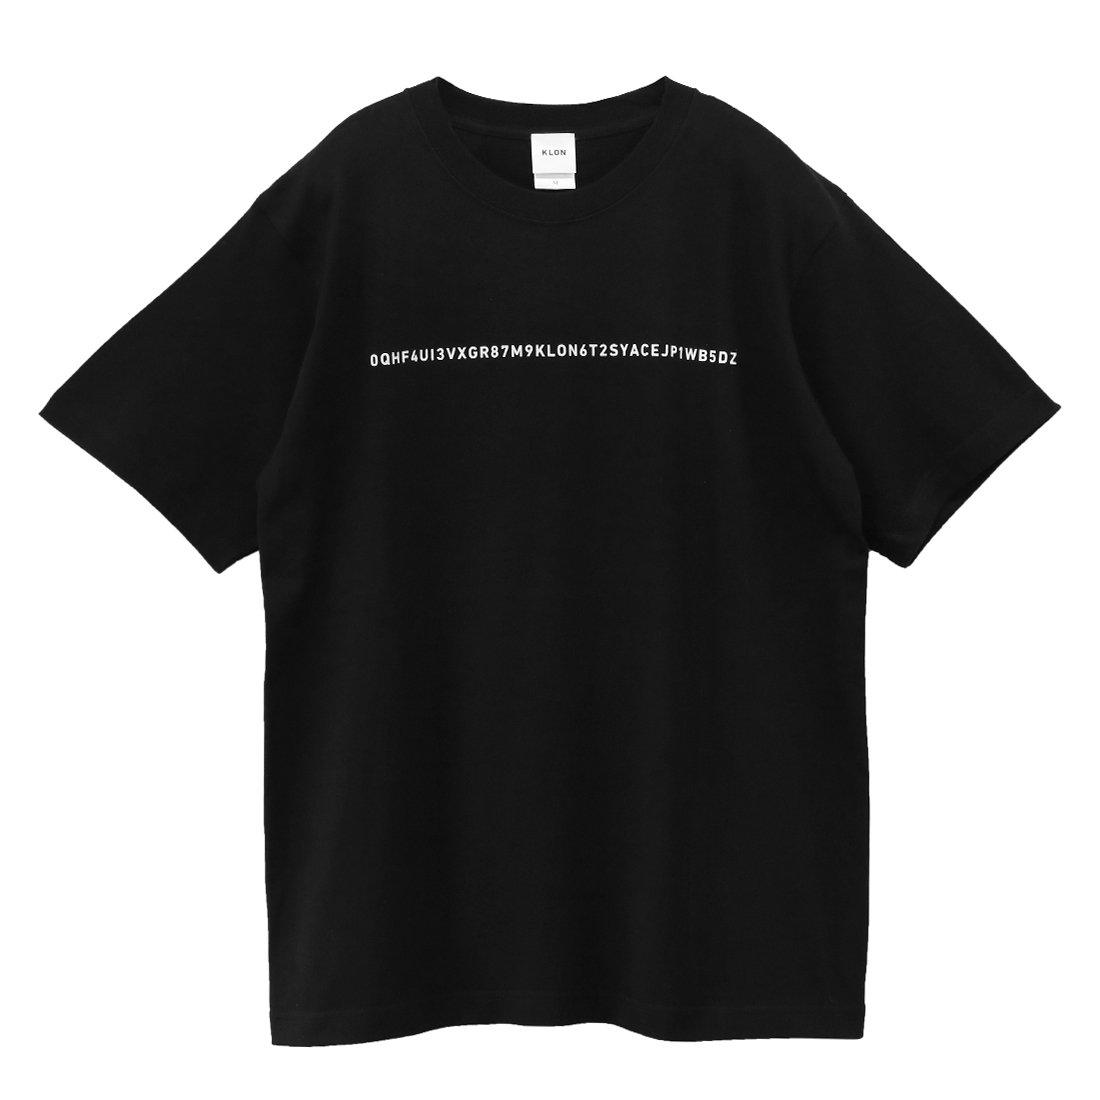 KLON Tshirts SERIAL NUMBER ONE LINES BLACK